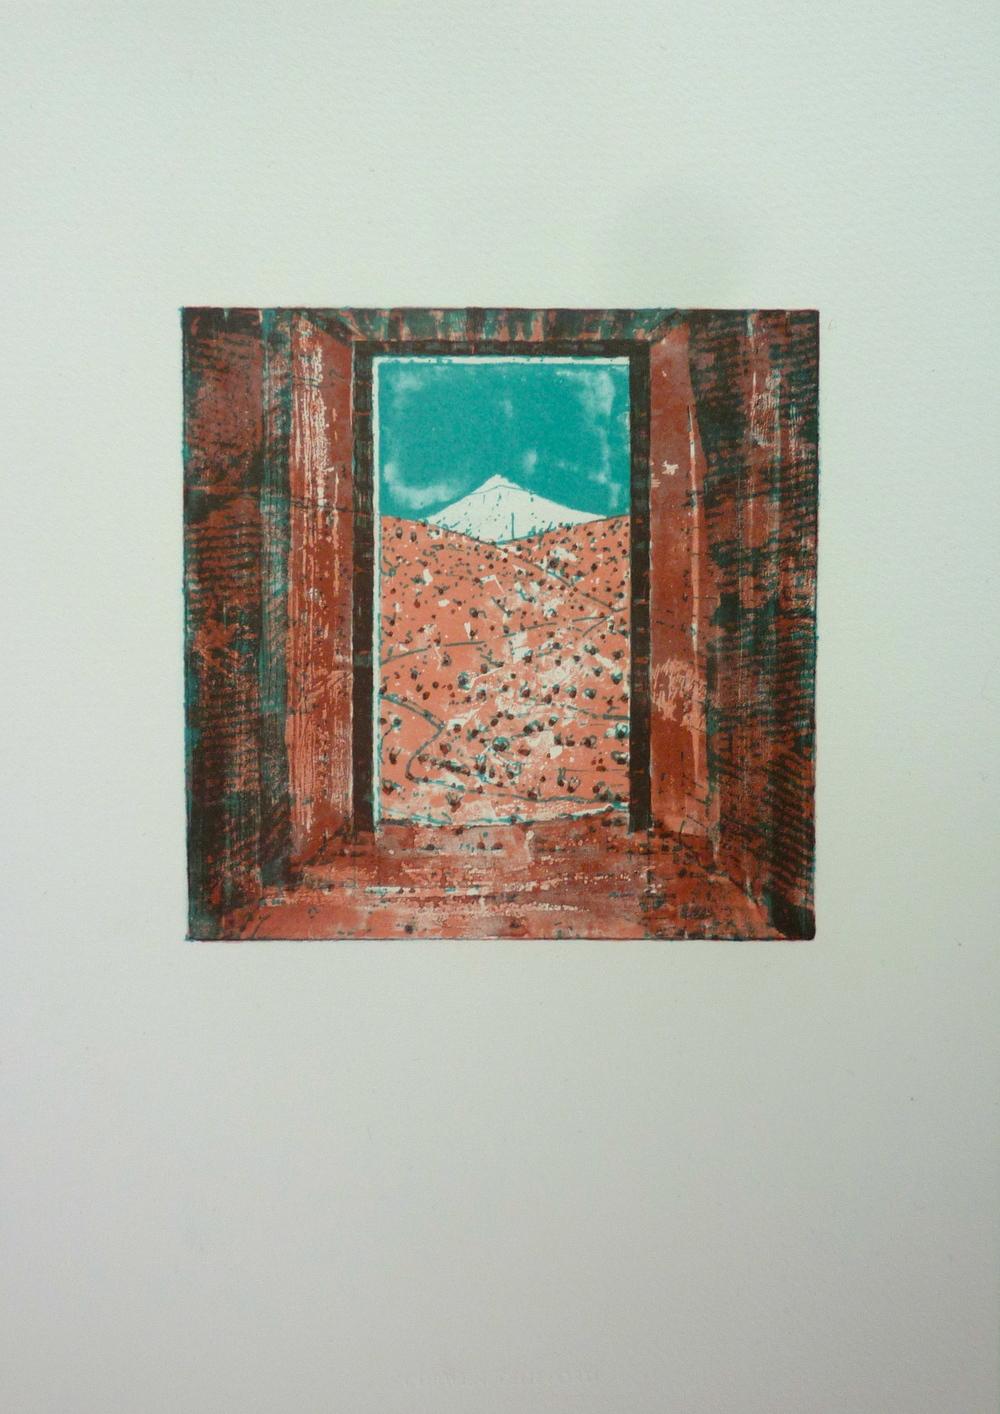 Portal 2009 (image size 13x13cm)